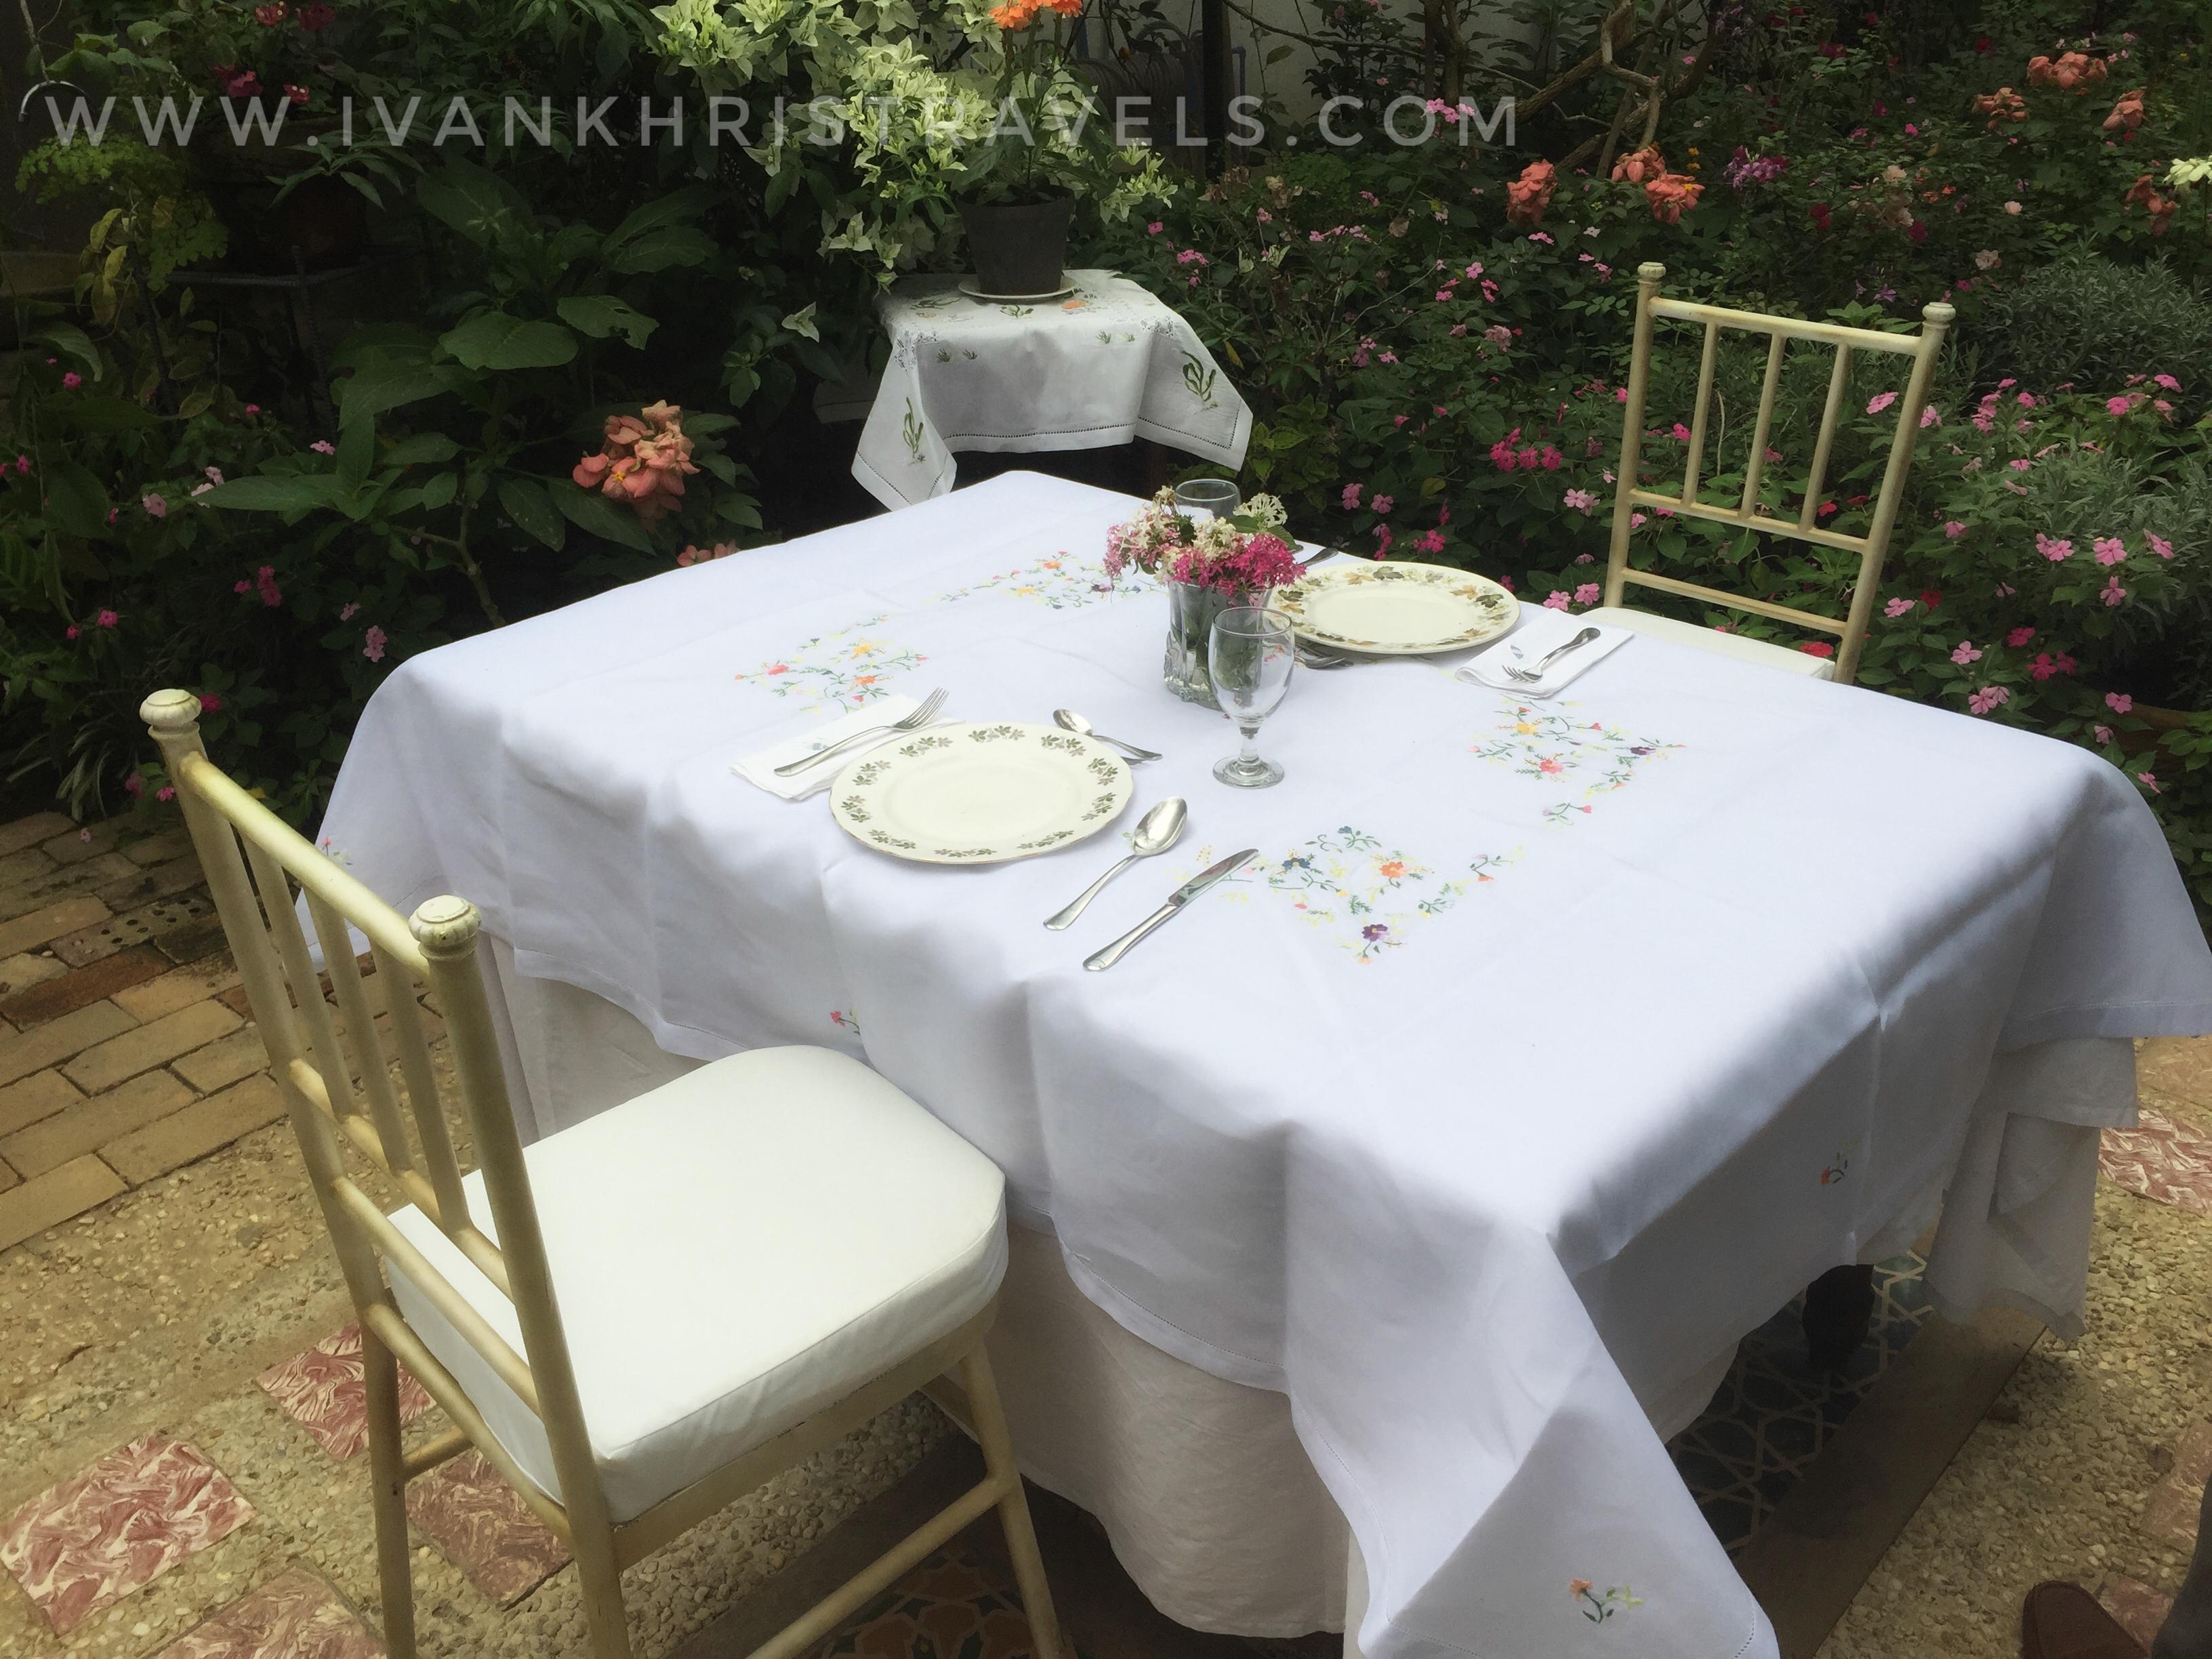 Sonya's Garden table inside the Proposal Garden